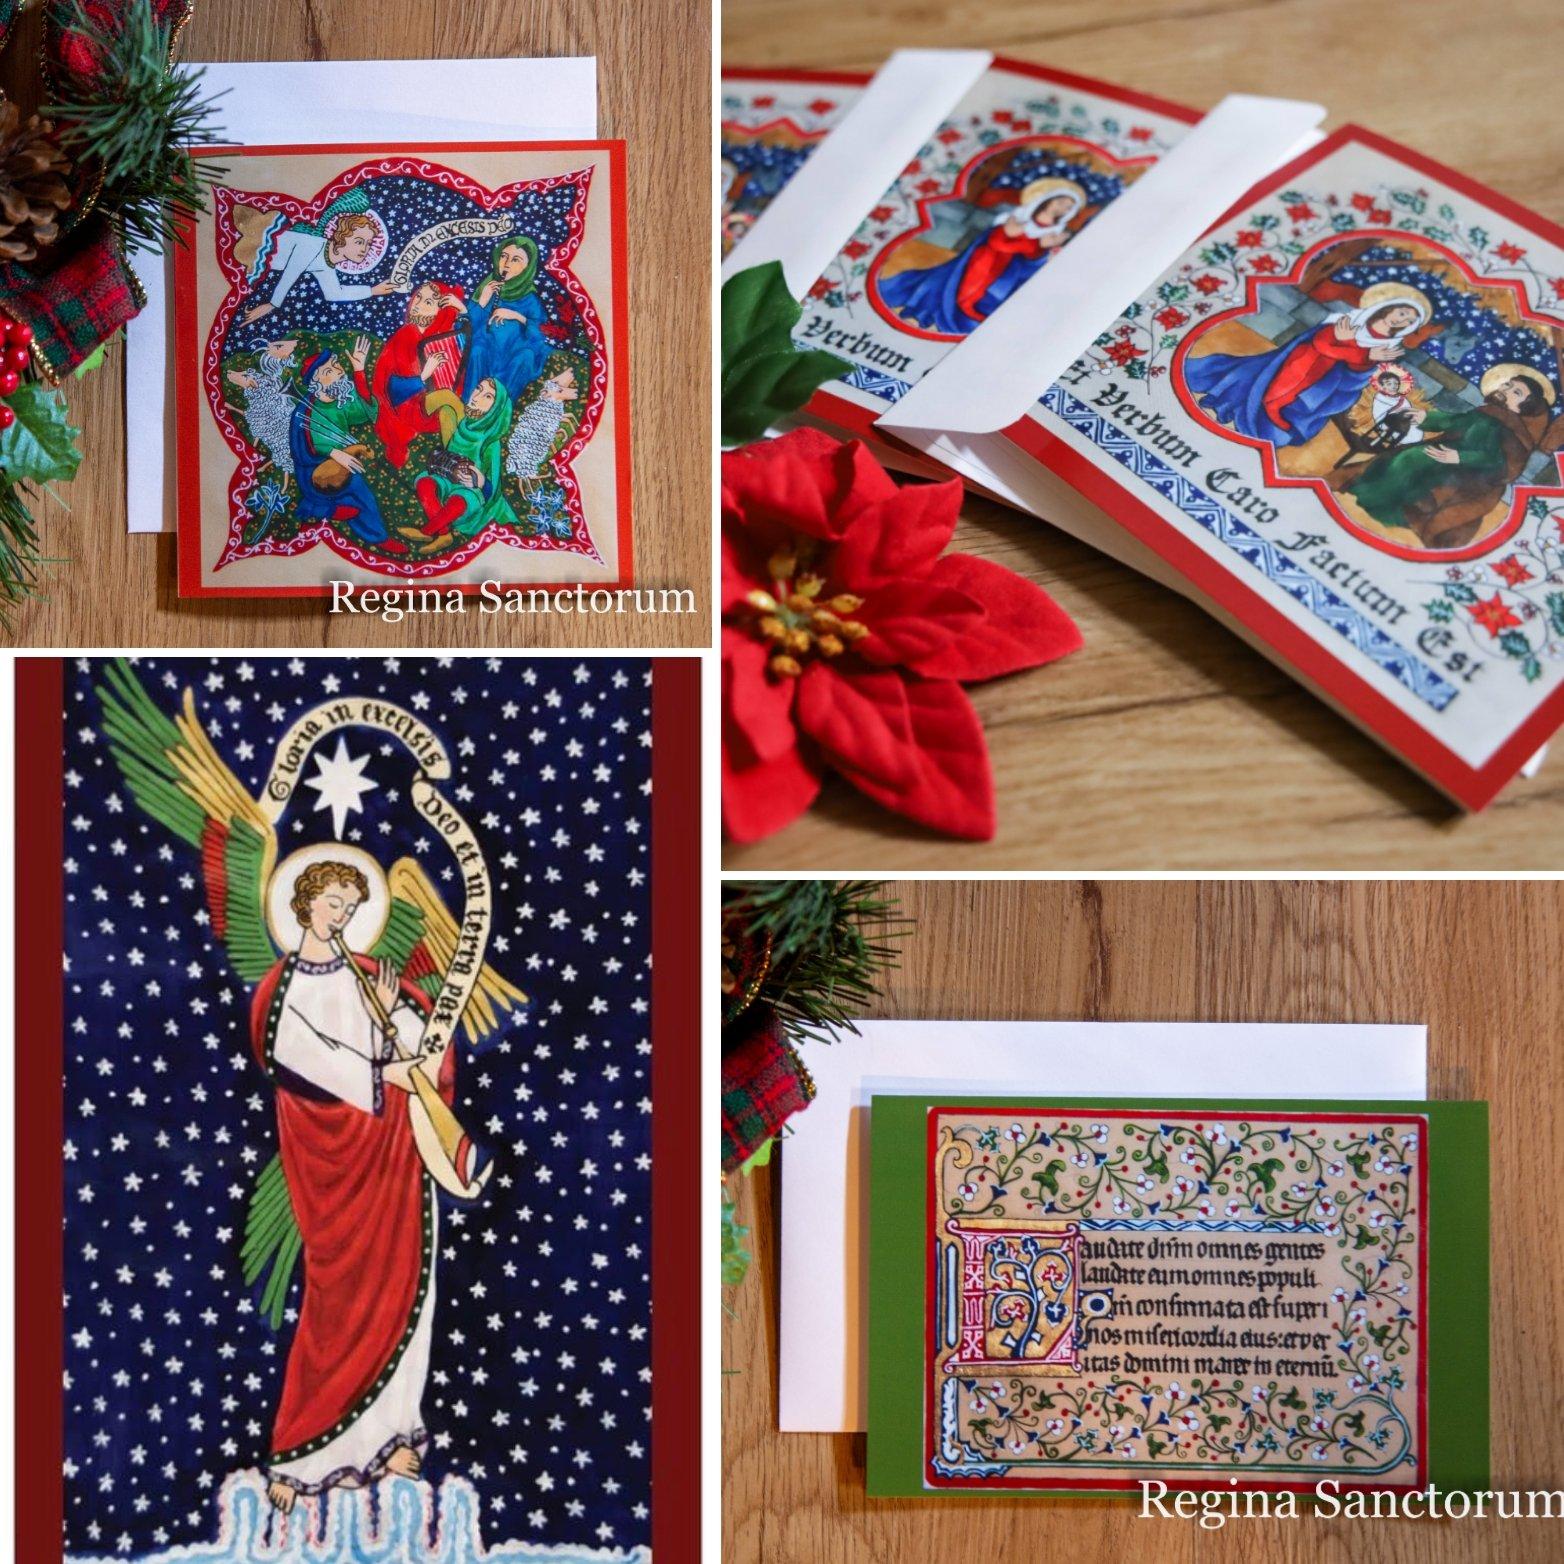 Regina Sanctorum Christmas Card